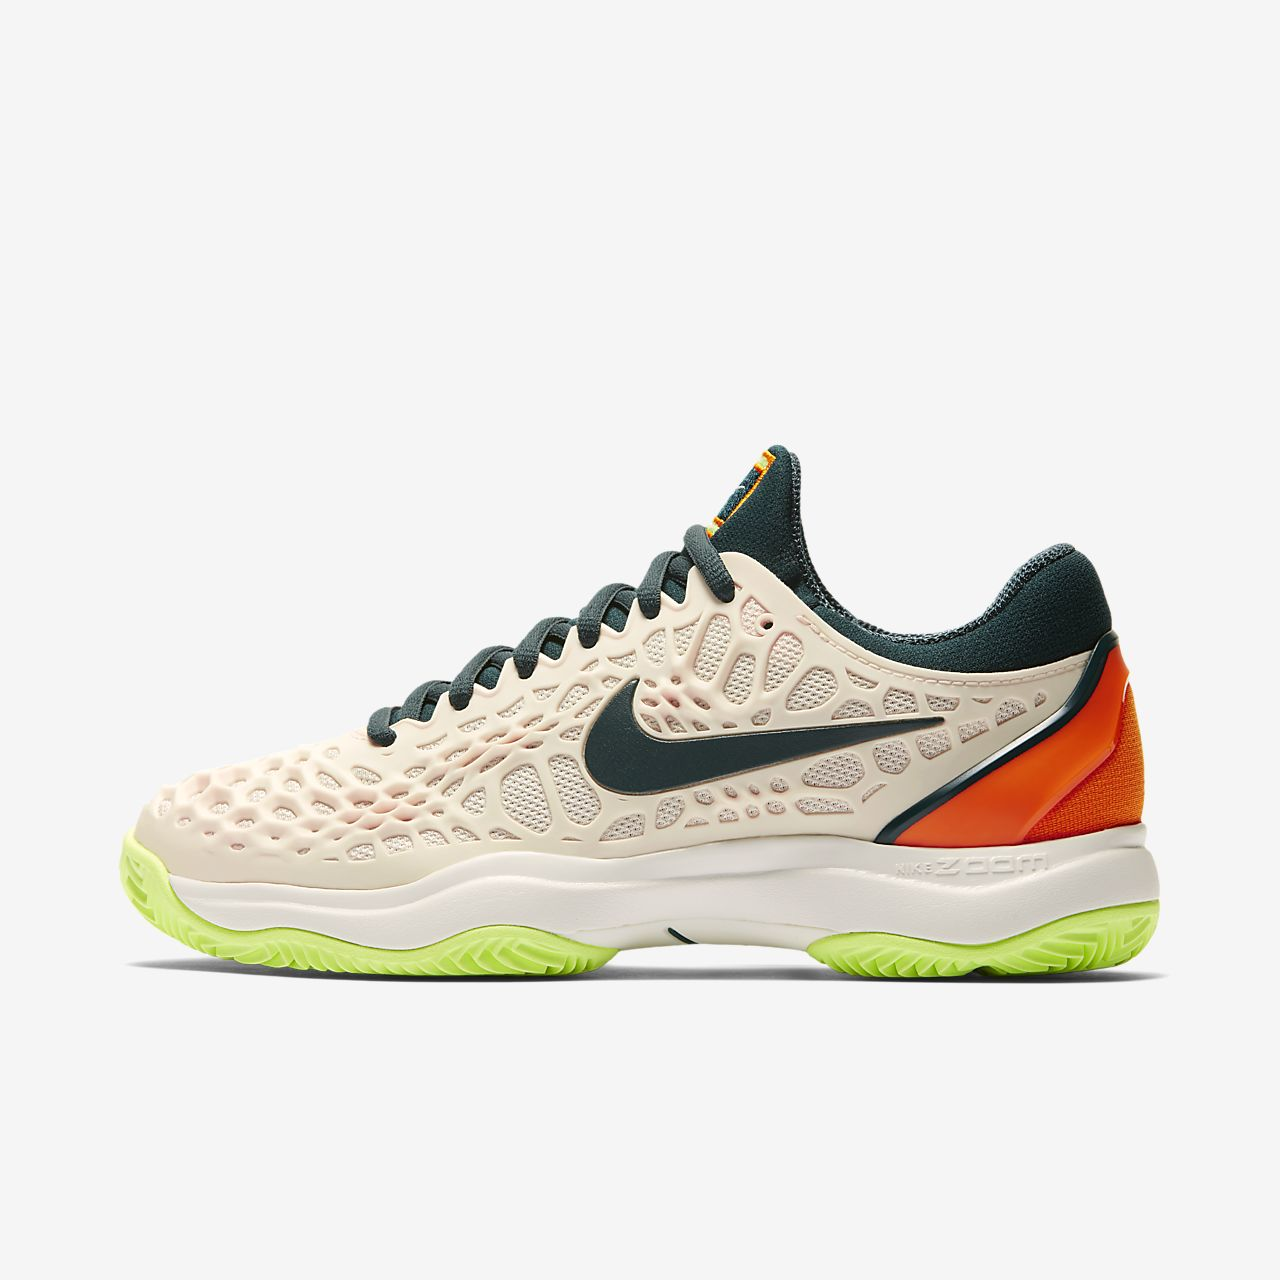 fba1b476412 Nike Zoom Cage 3 Clay Women s Tennis Shoe. Nike.com GB